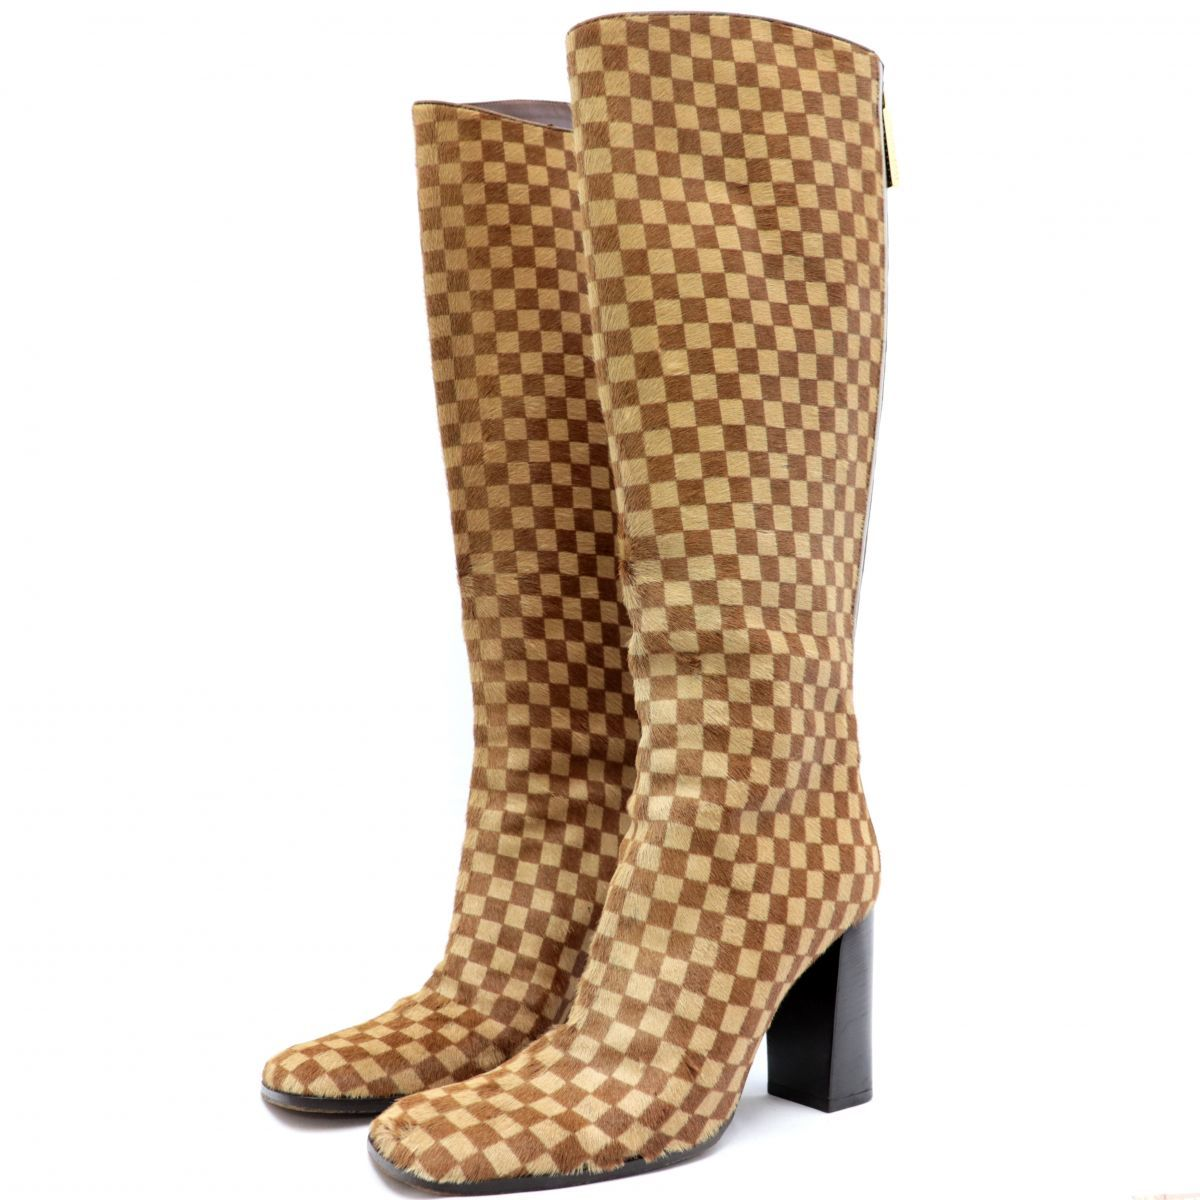 Louis Vuitton Damier Harako Long Heel Boots Women's Brown 34.5 Leather 1R0999